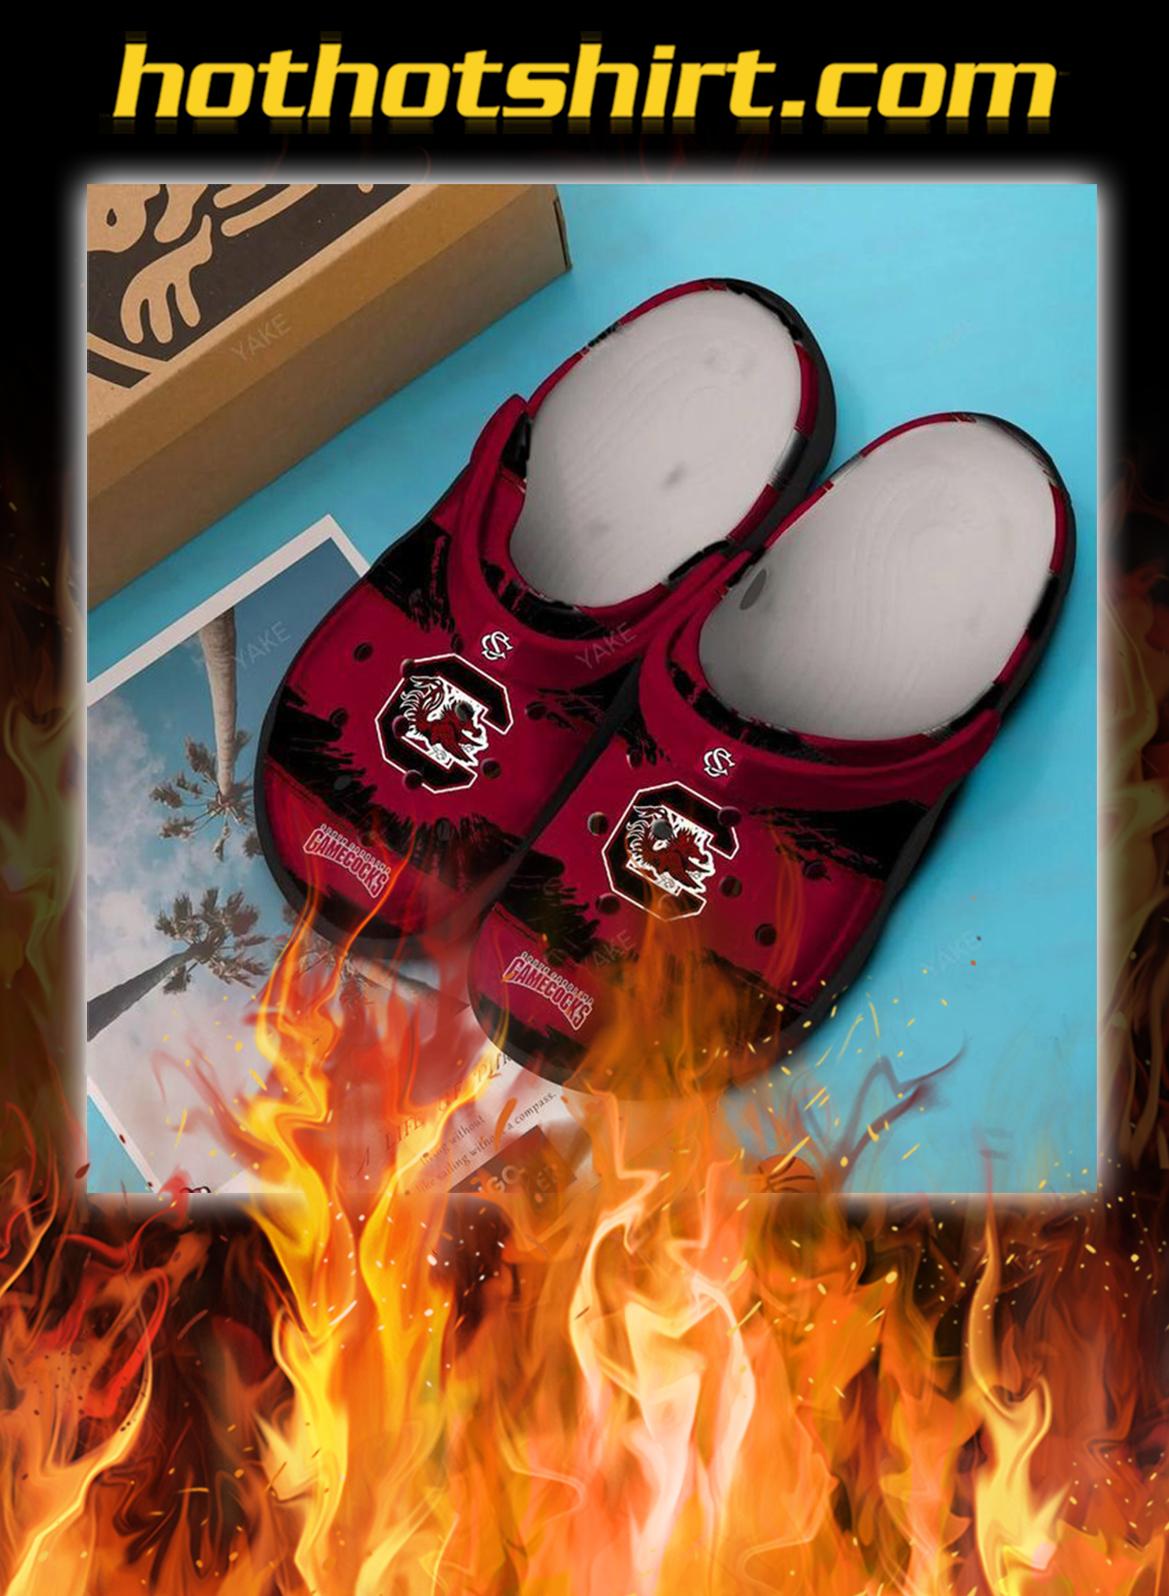 South carolina gamecocks football crocband crocs shoes- pic 1